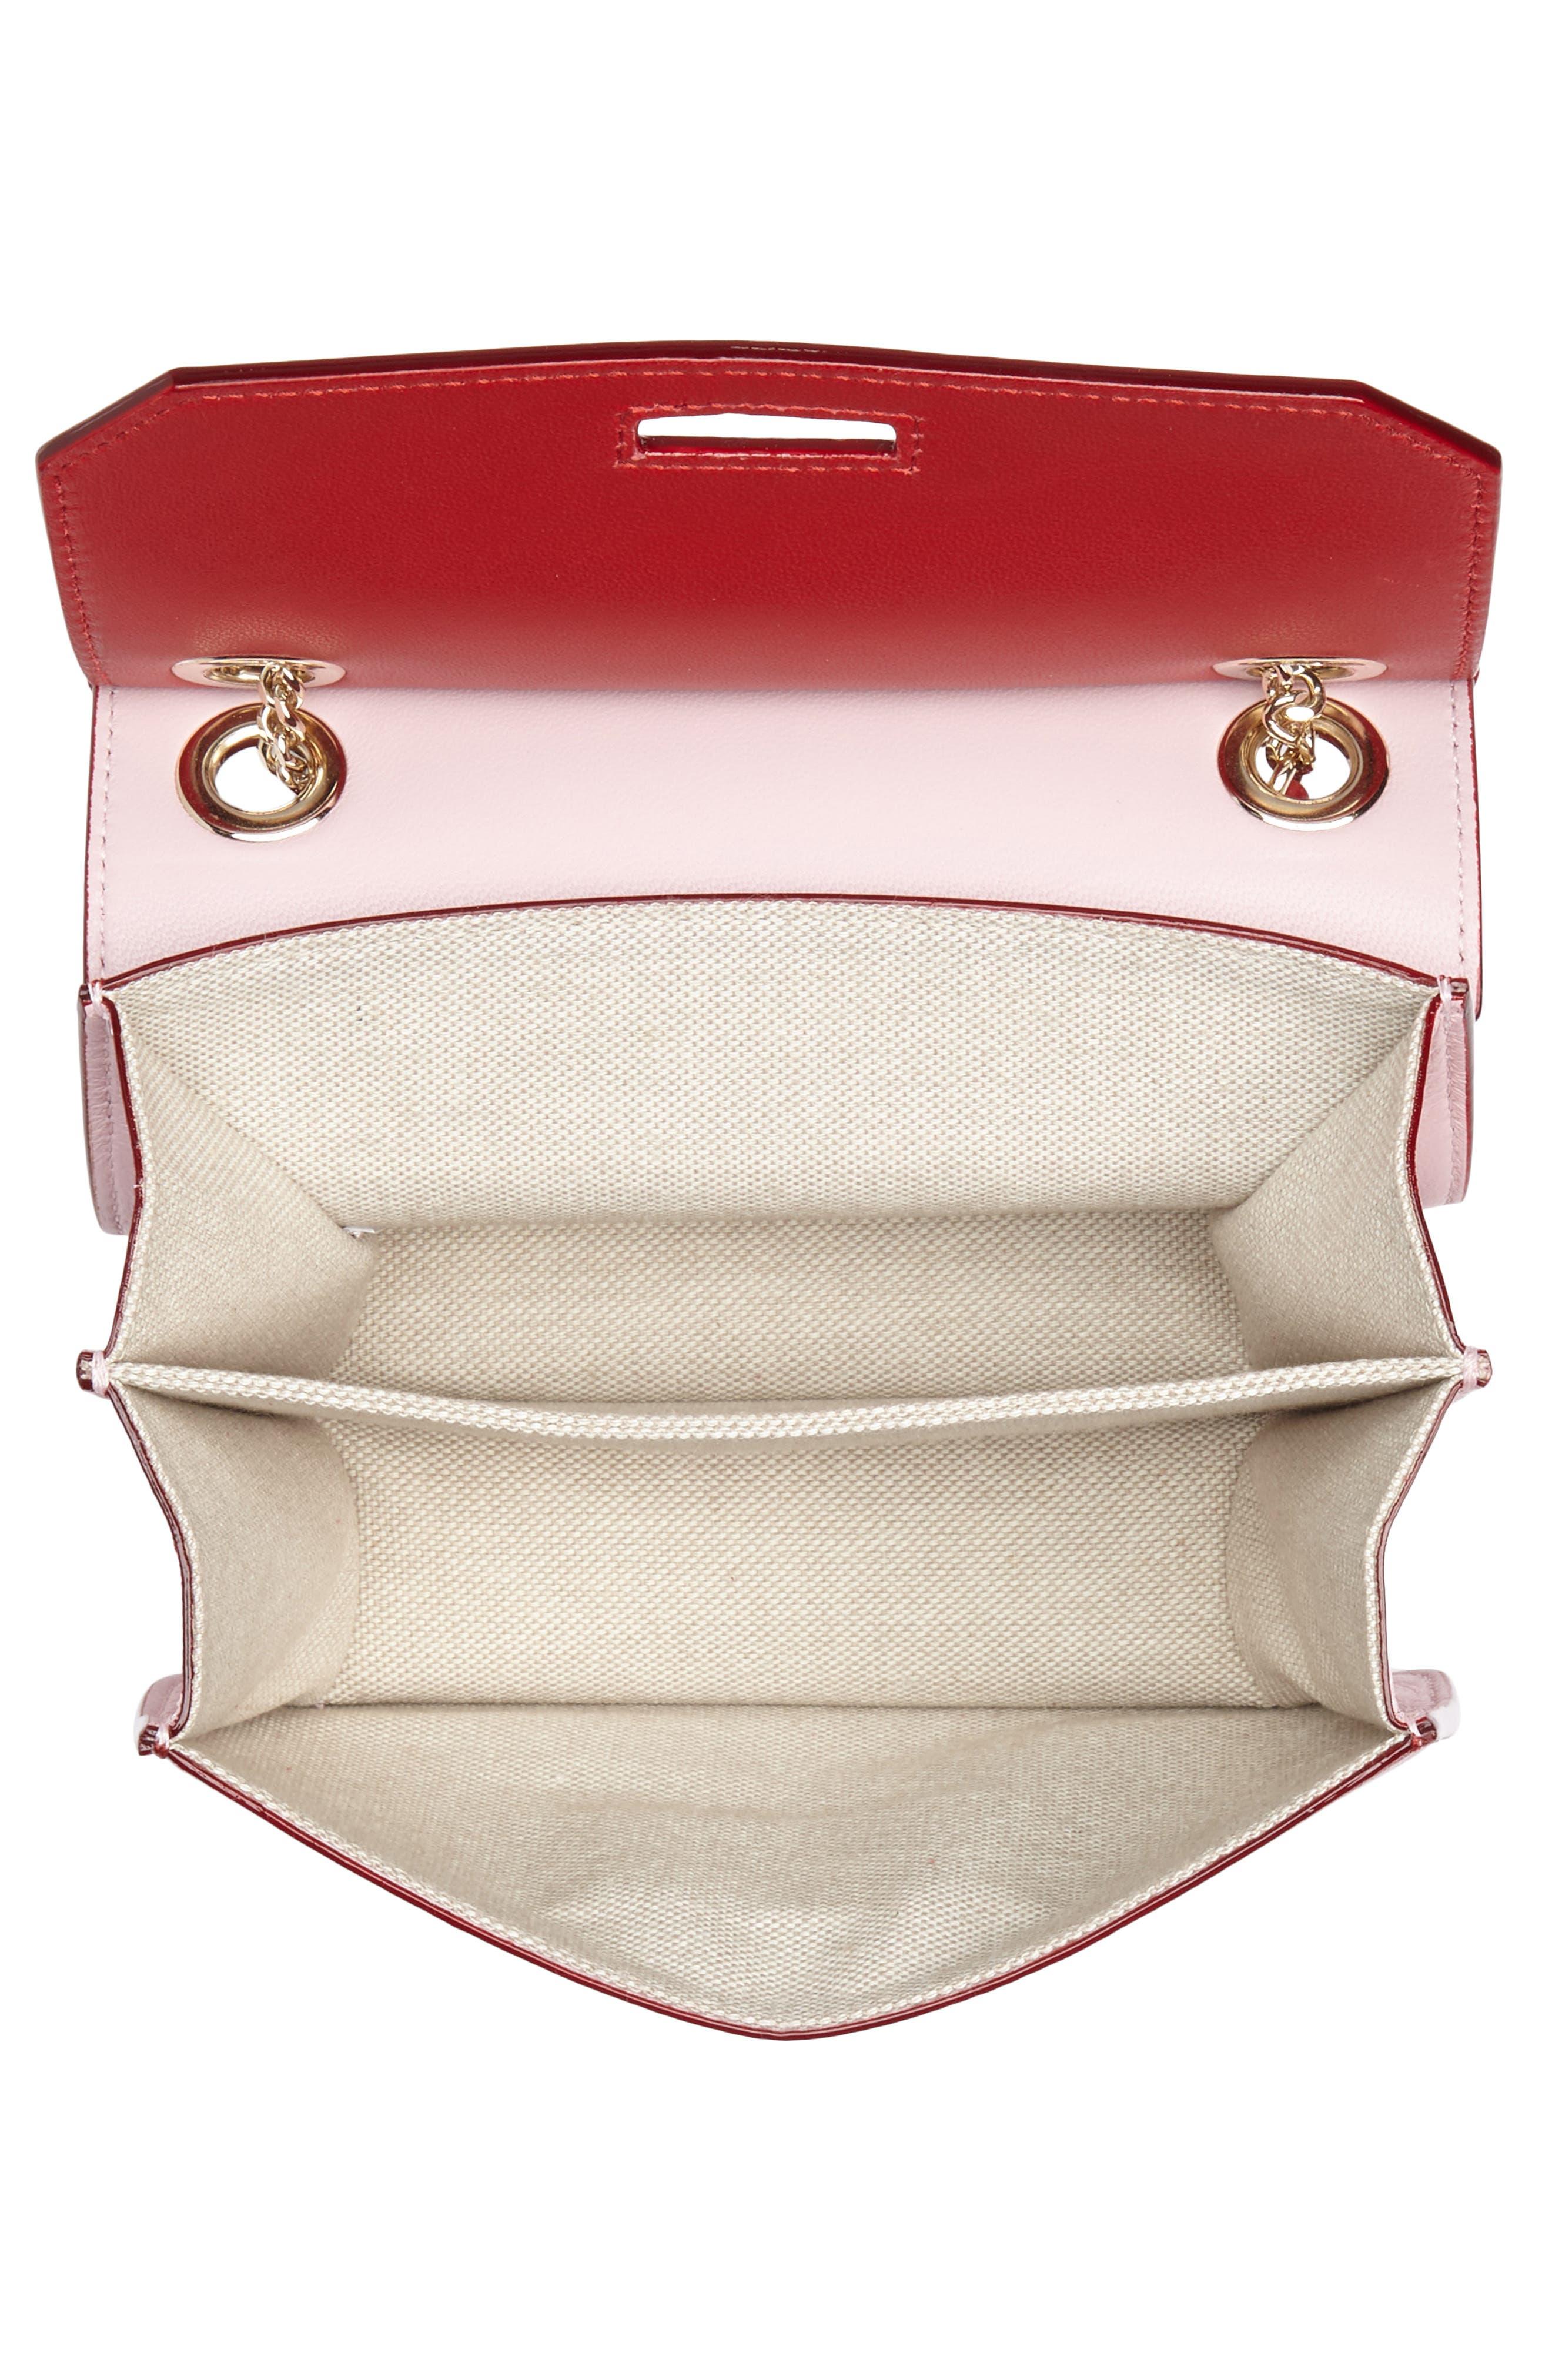 Rebel Mini Colorblock Leather Crossbody Bag,                             Alternate thumbnail 4, color,                             Red/ Rosewater